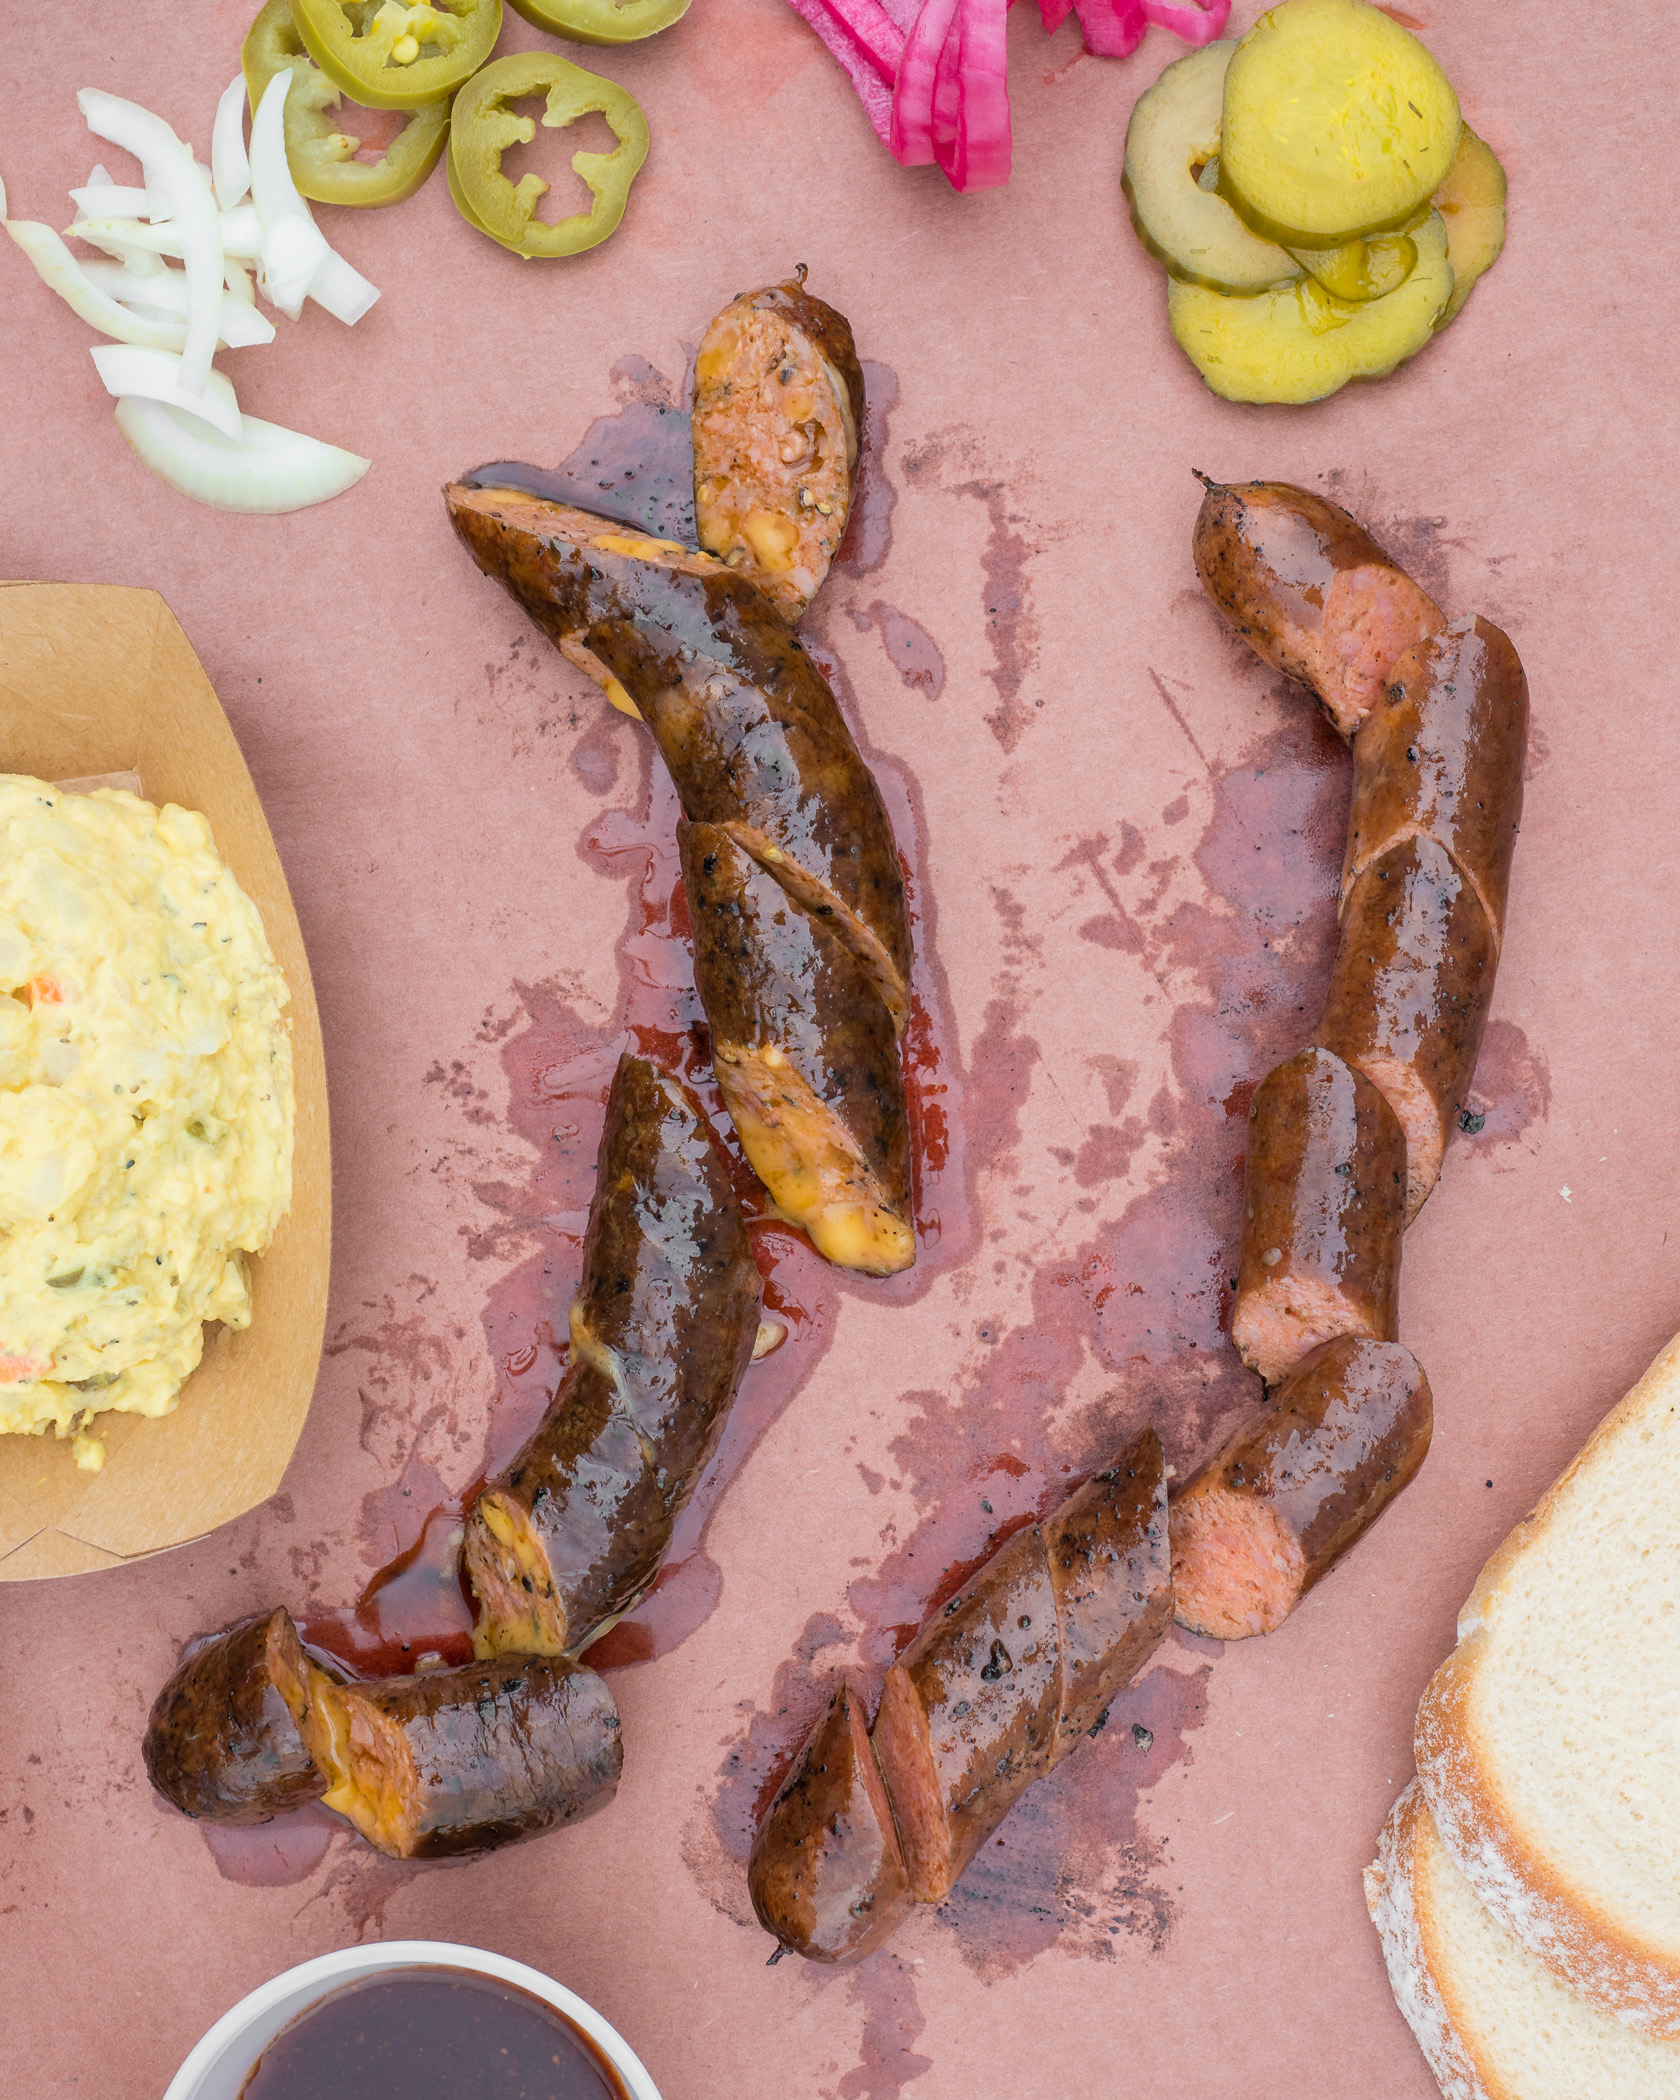 Jeremy Pawlowski Portland Texas Austin Amarillo Food Photographer Photography Fare Photo Studios bbq barbecue barbeque jalapeno sausage